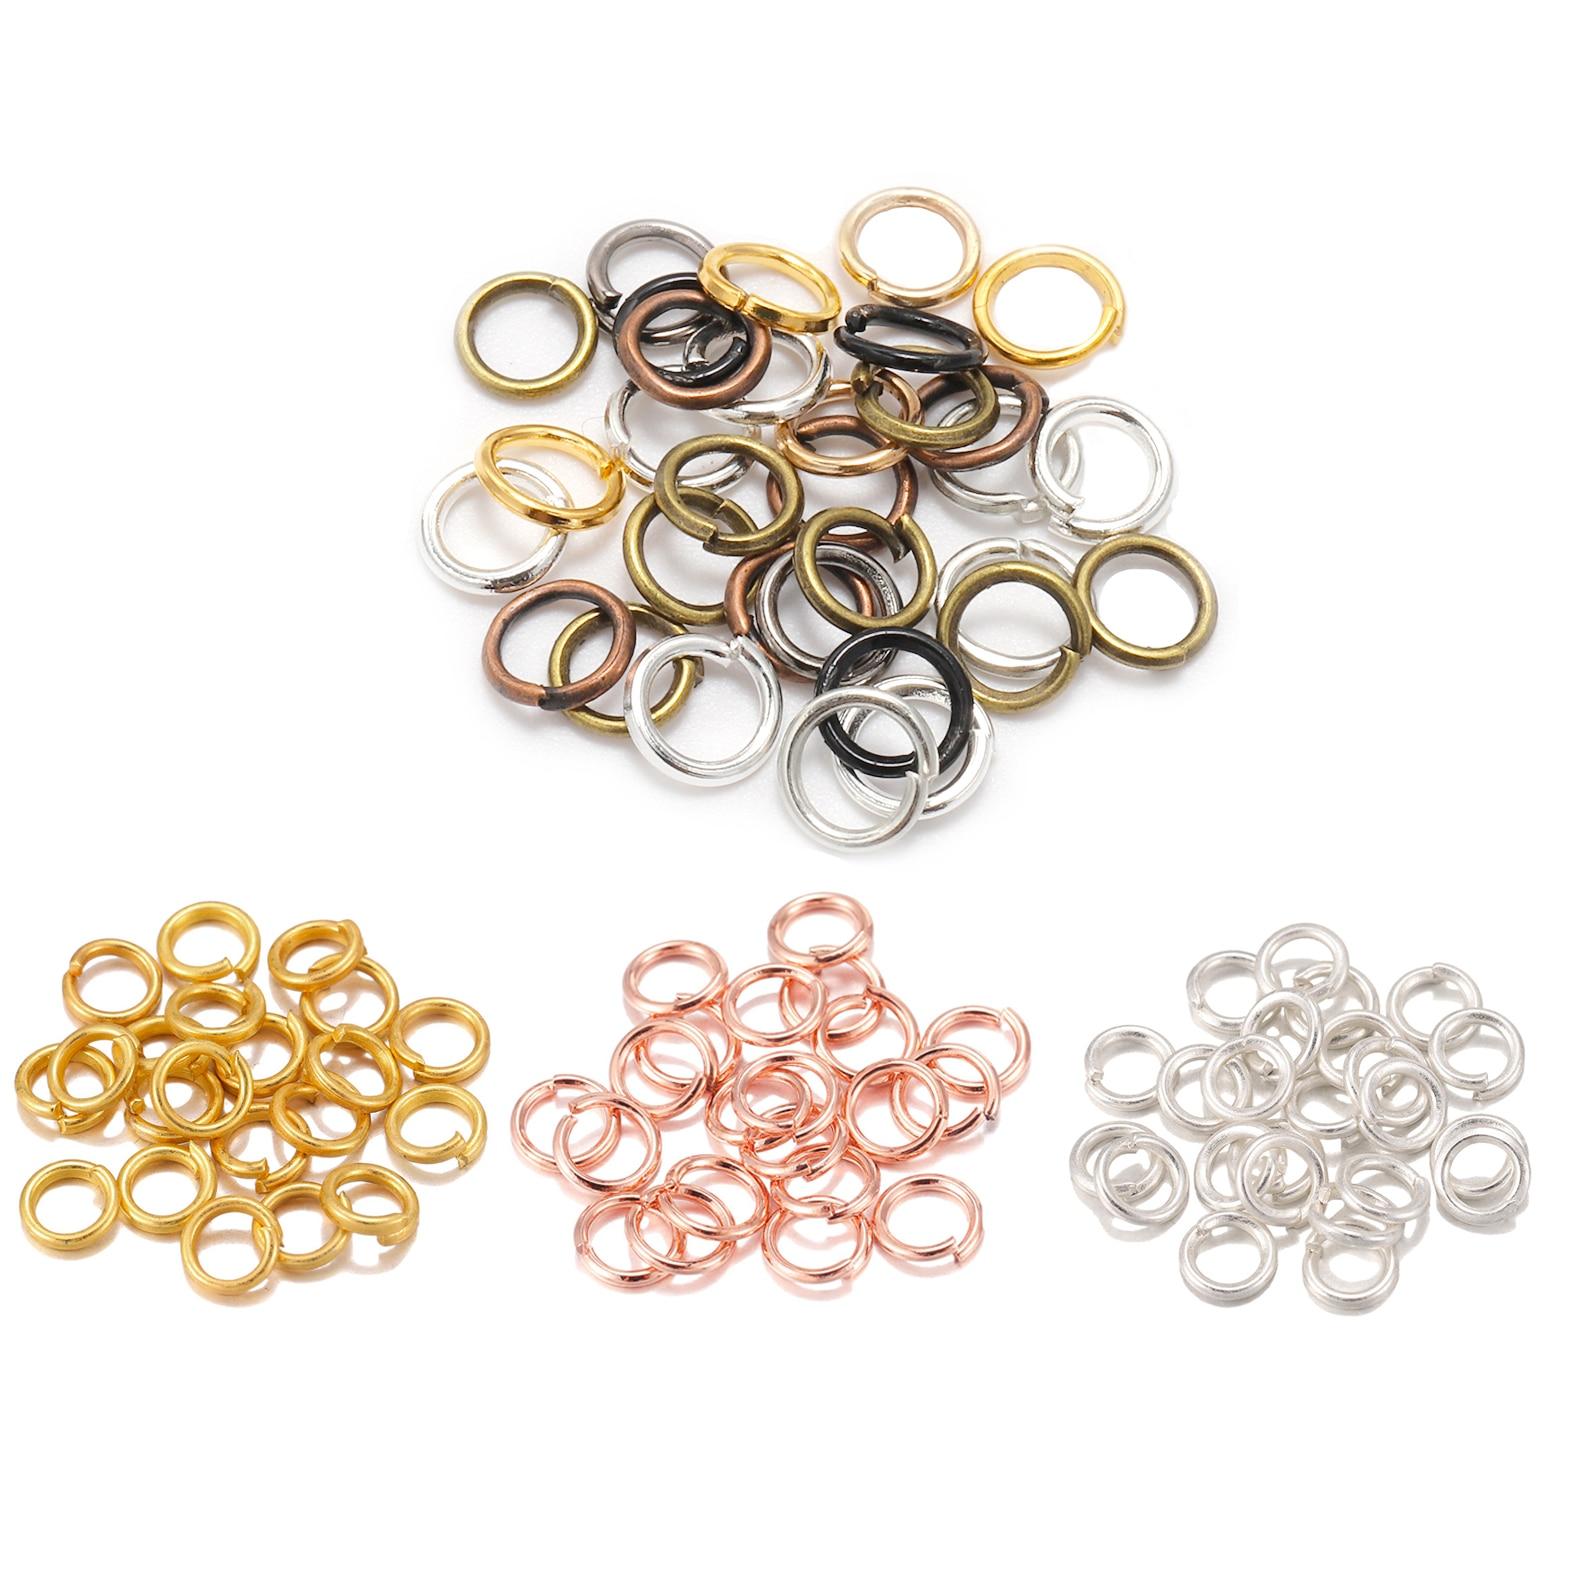 200pcs 3-16mm Gold Rhodium Metal Jump Ring Open Single Loops Split Rings Supplies For DIY Jewelry Handmade Accessories